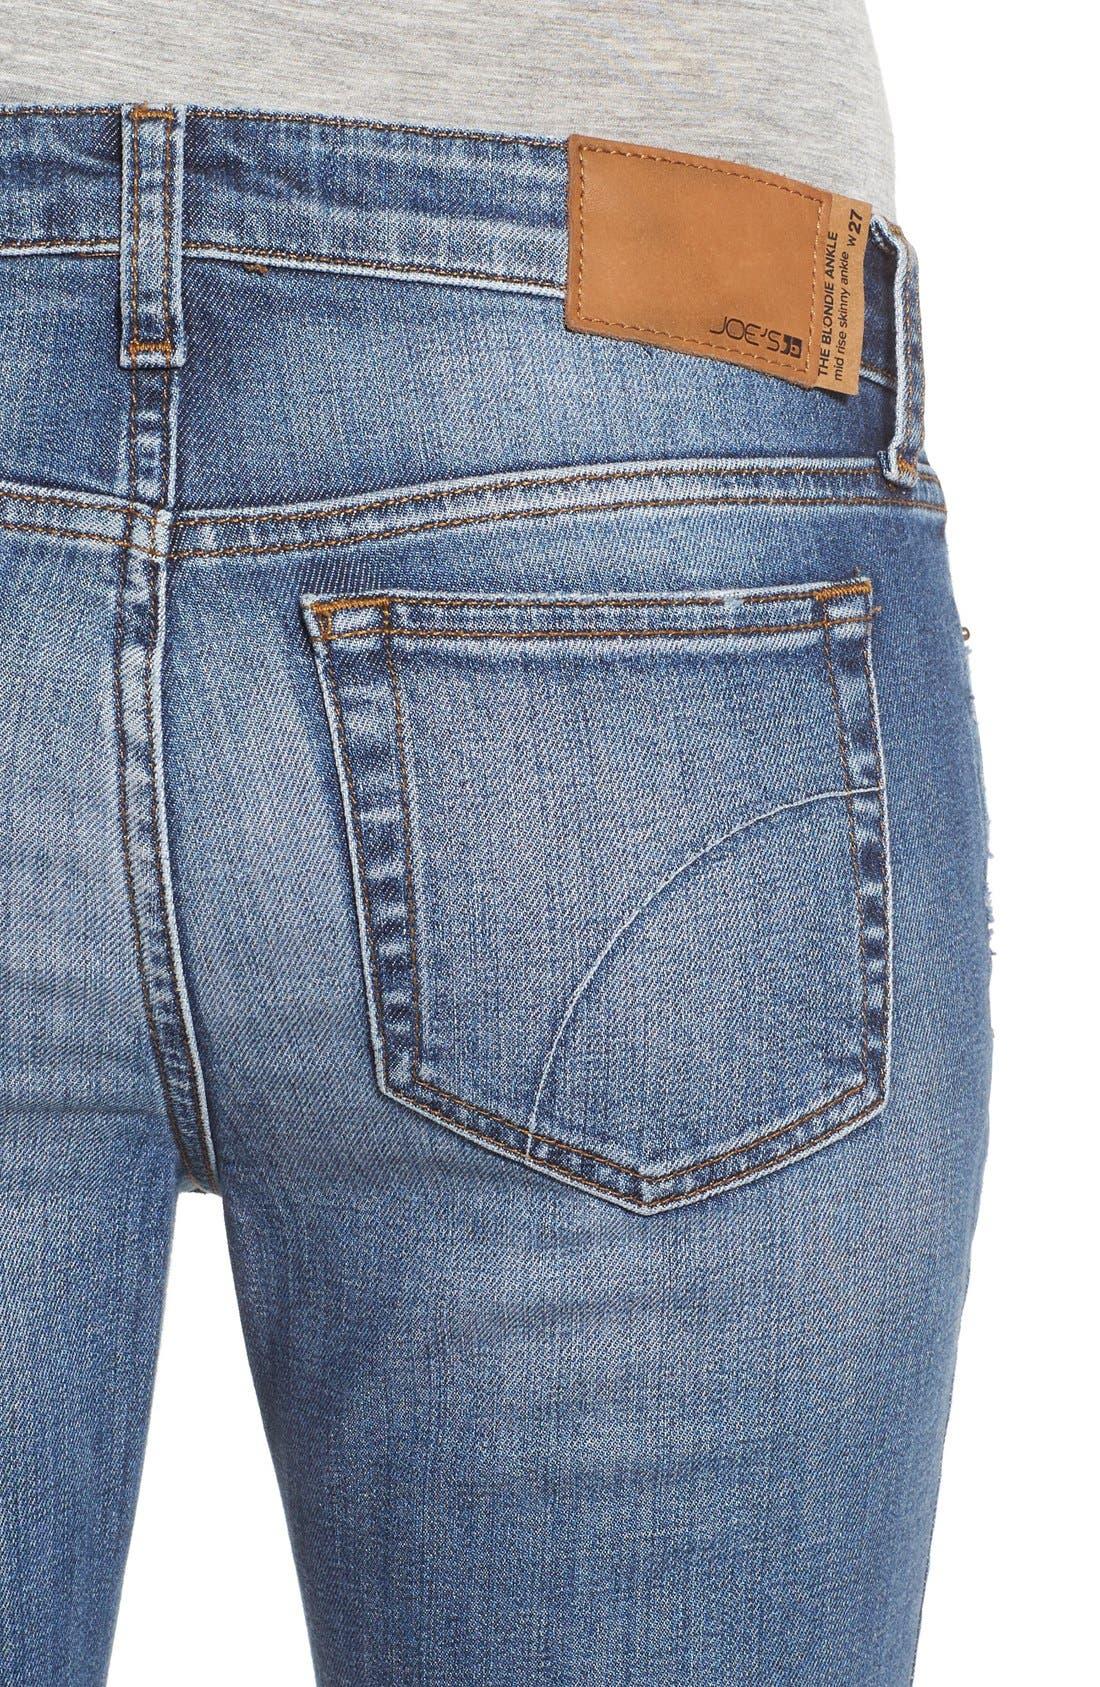 Alternate Image 4  - Joe's 'Collector's - Blondie' Destroyed Ankle Skinny Jeans (Coppola)